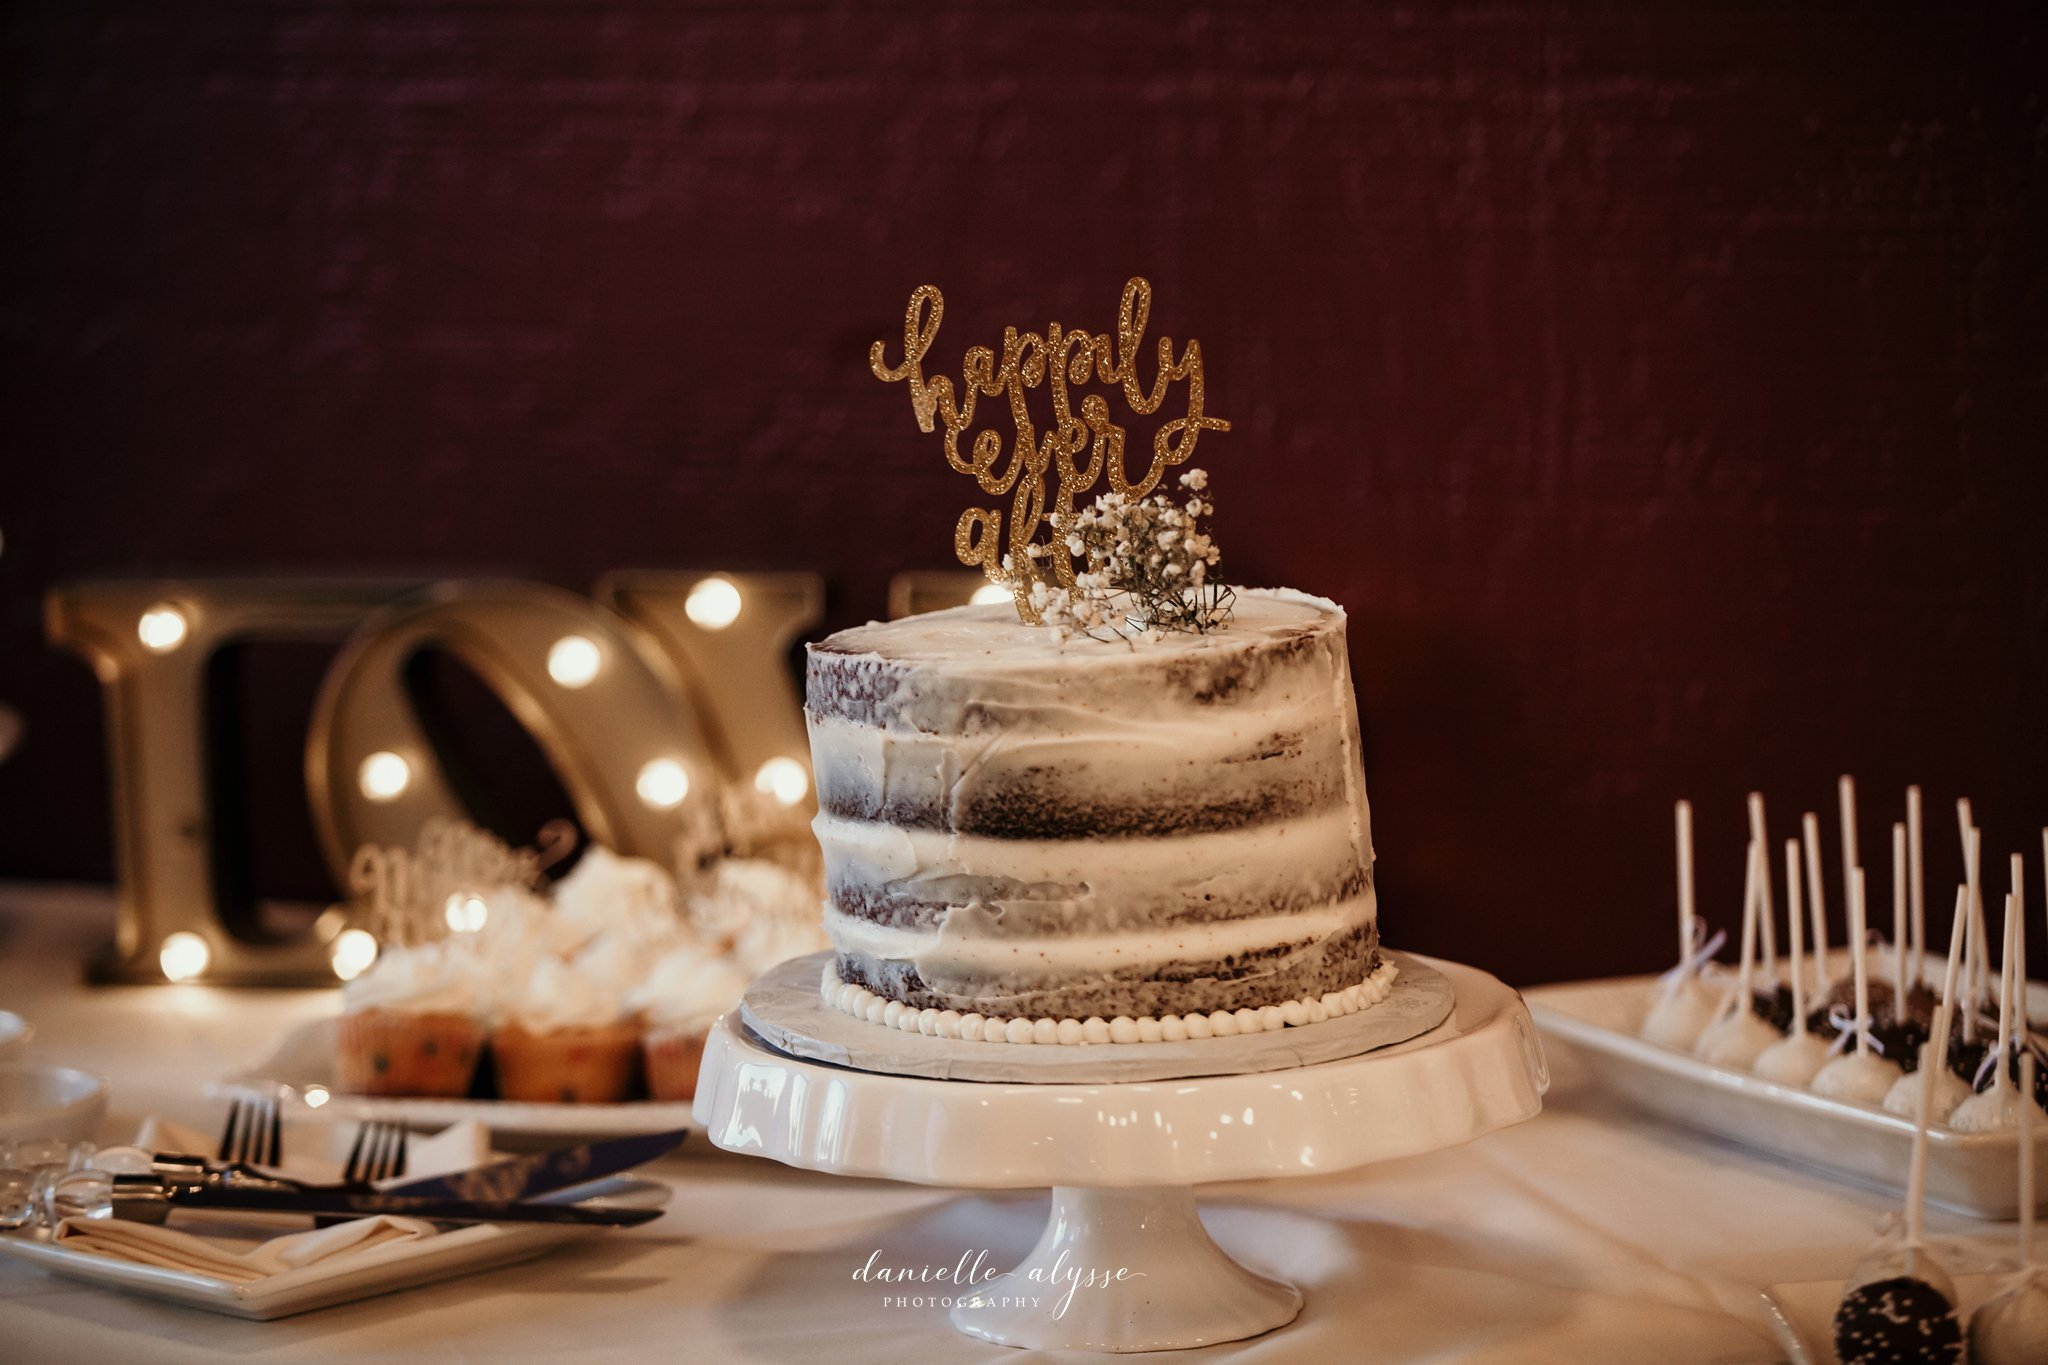 180831_wedding_stephanie_heavenly_south_lake_tahoe_danielle_alysse_photography_destination_blog_1064_WEB.jpg